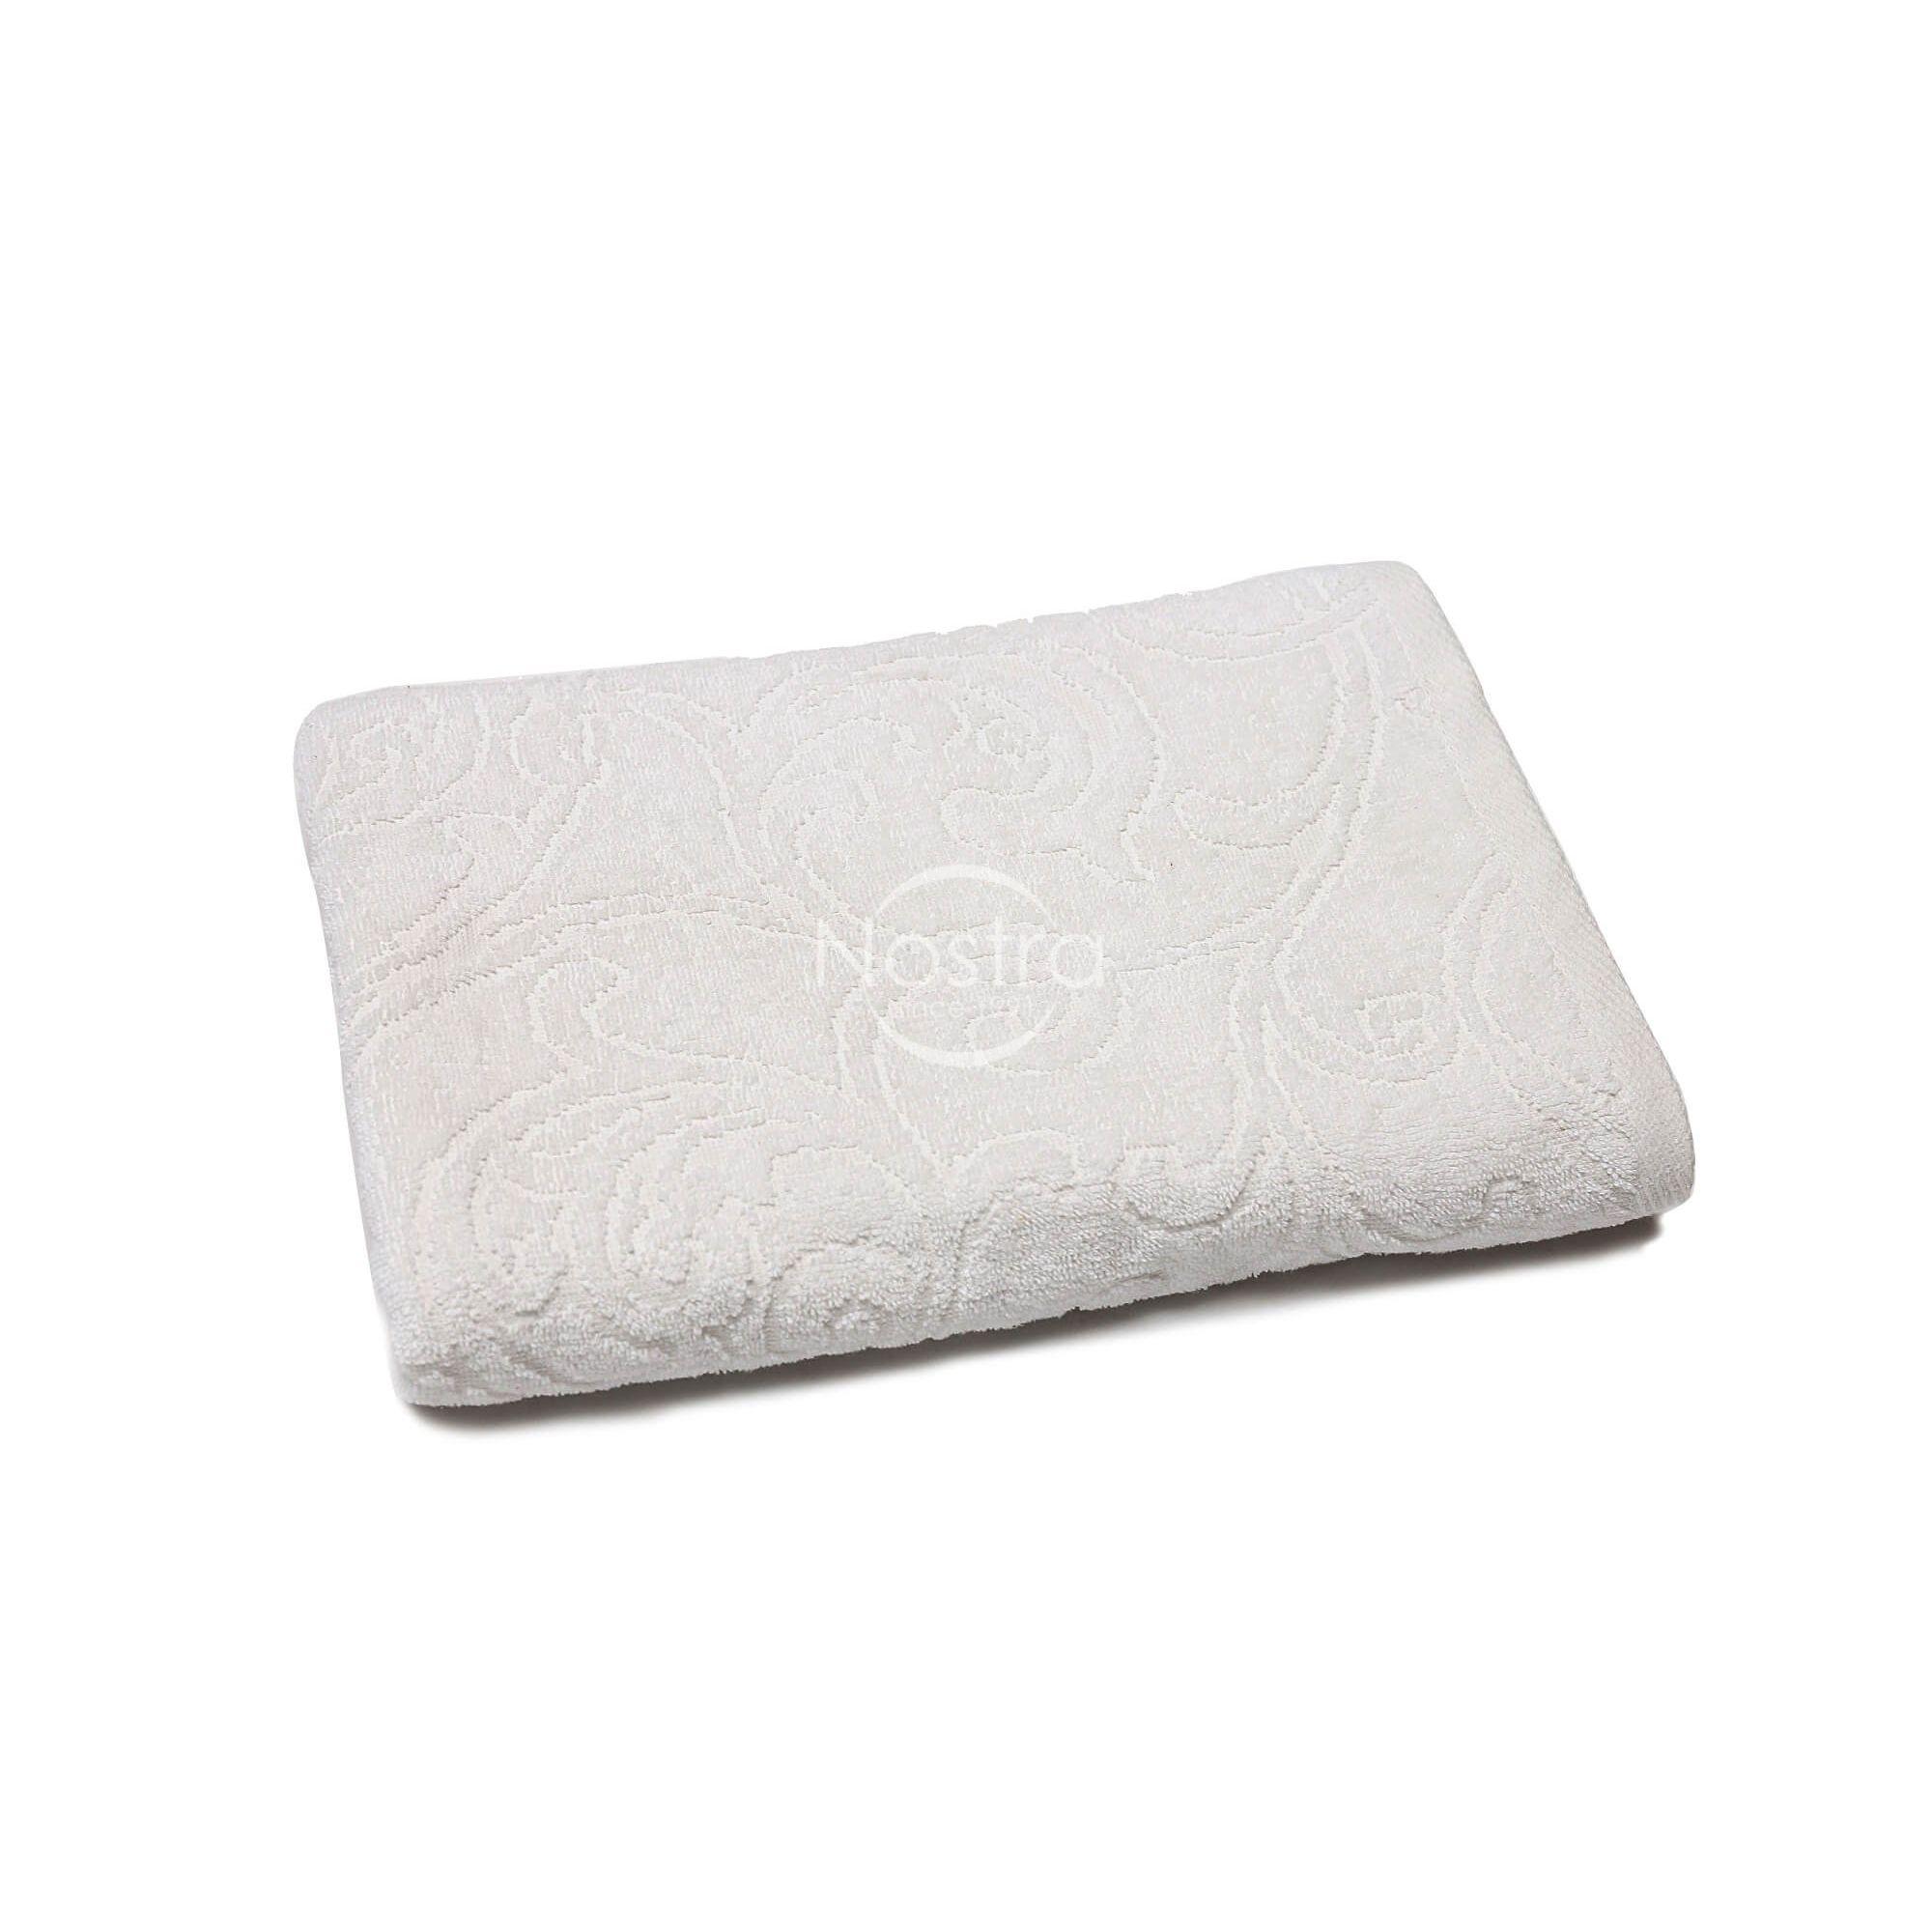 Jacquard towels 500j